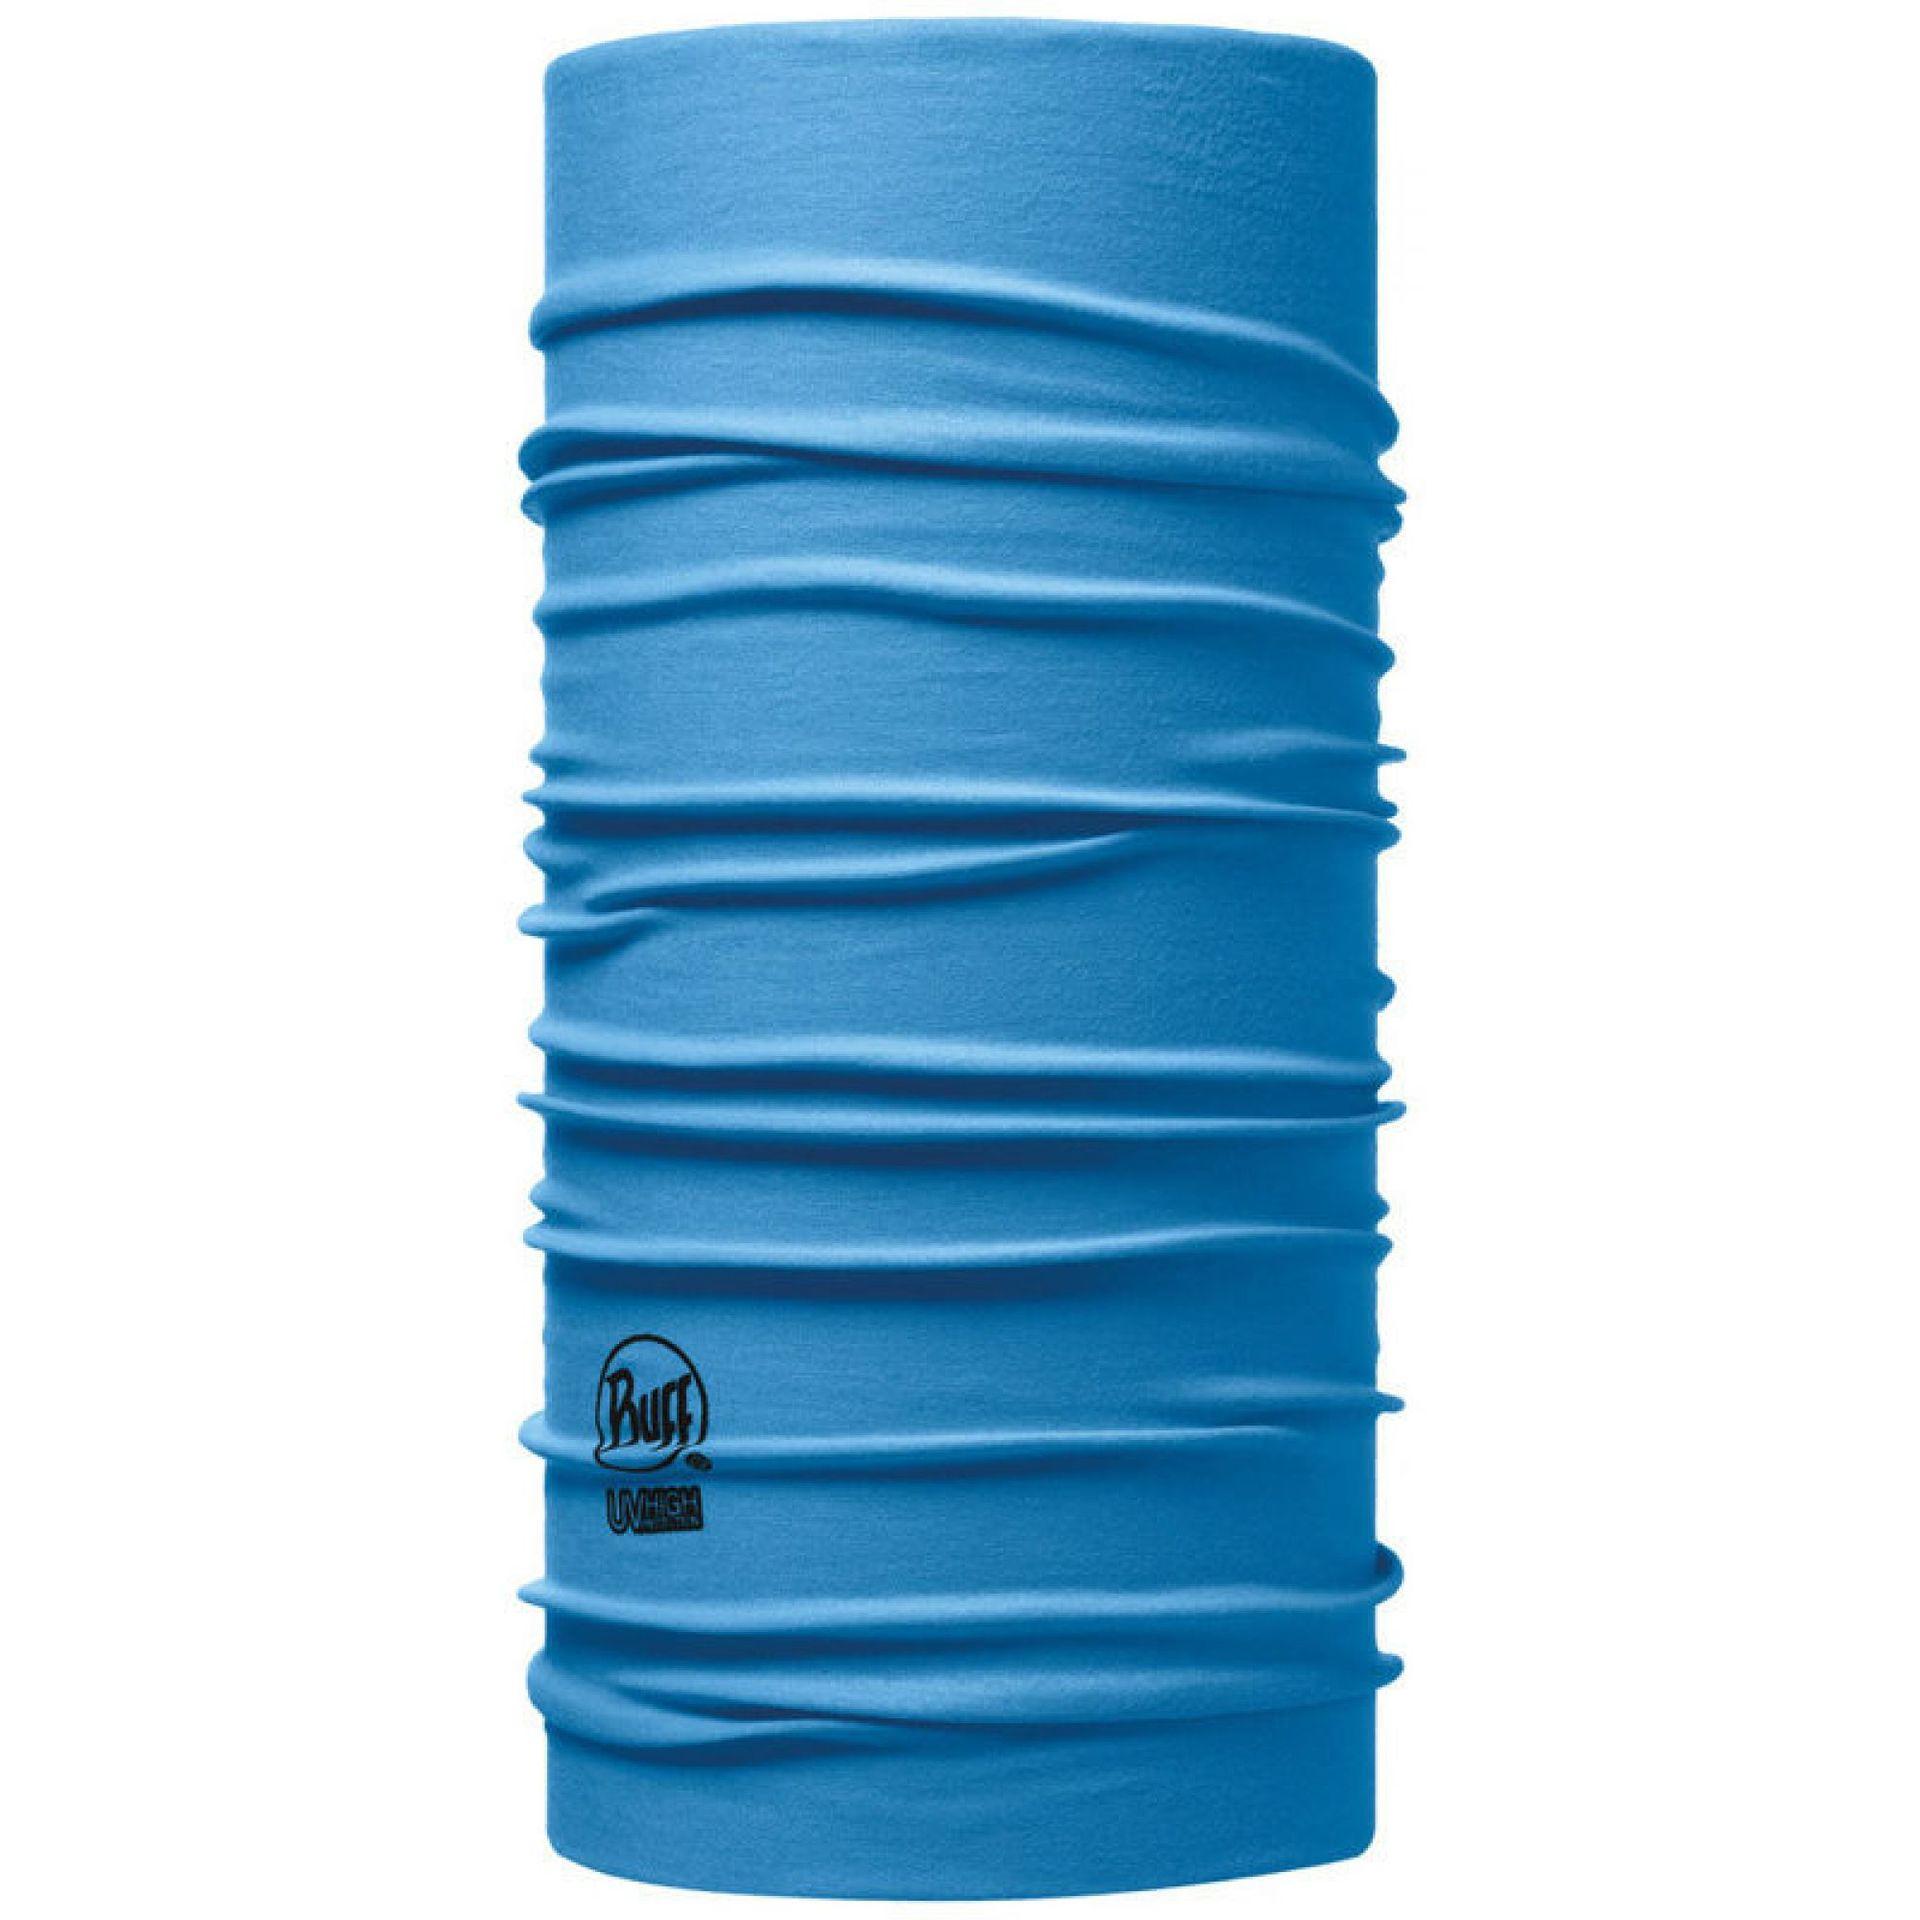 CHUSTA BUFF # HIGH UV PROTECTION BRILLIANT BLU